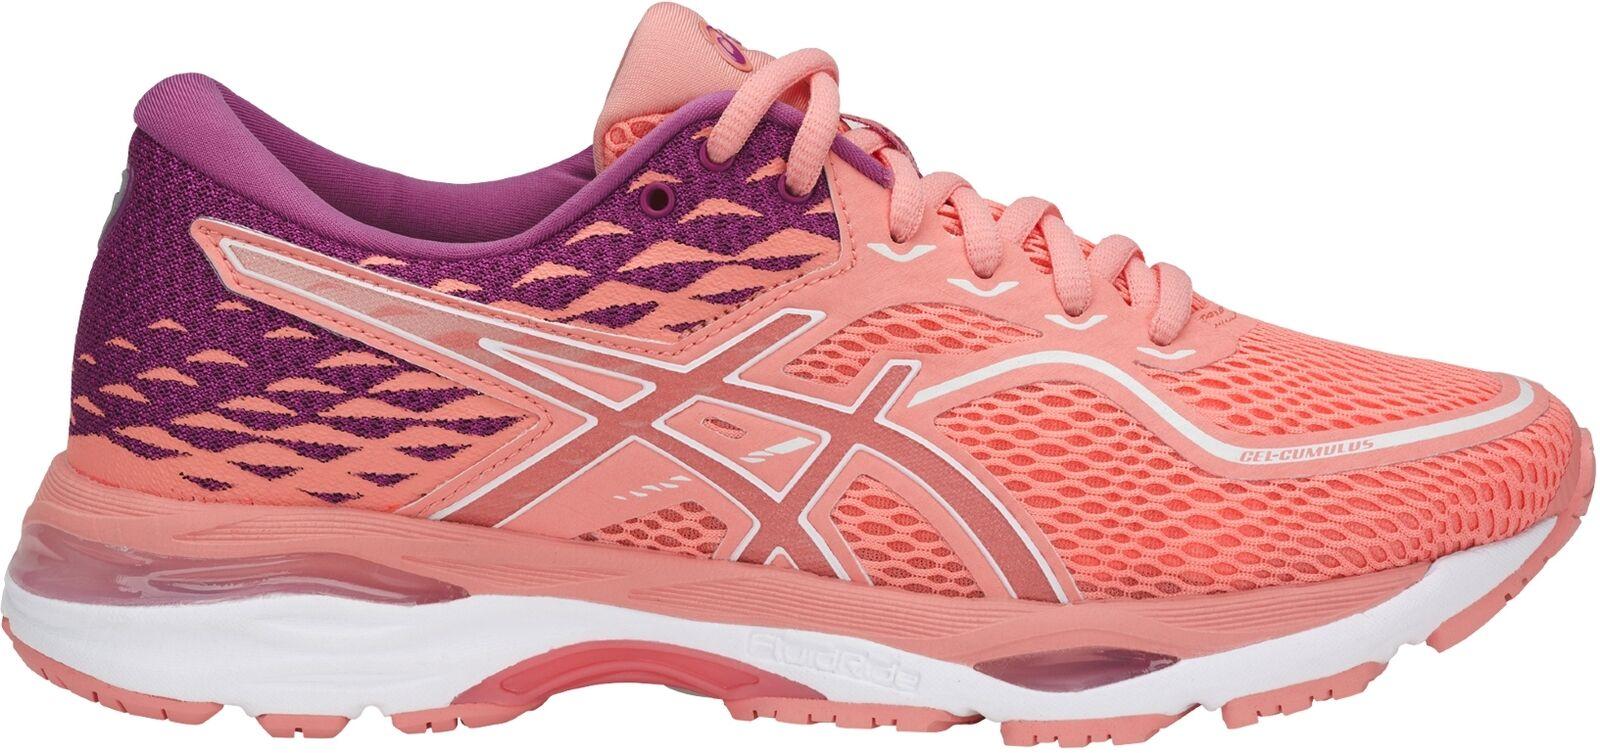 Asics Gel Cumulus 19 Womens Running shoes - Pink